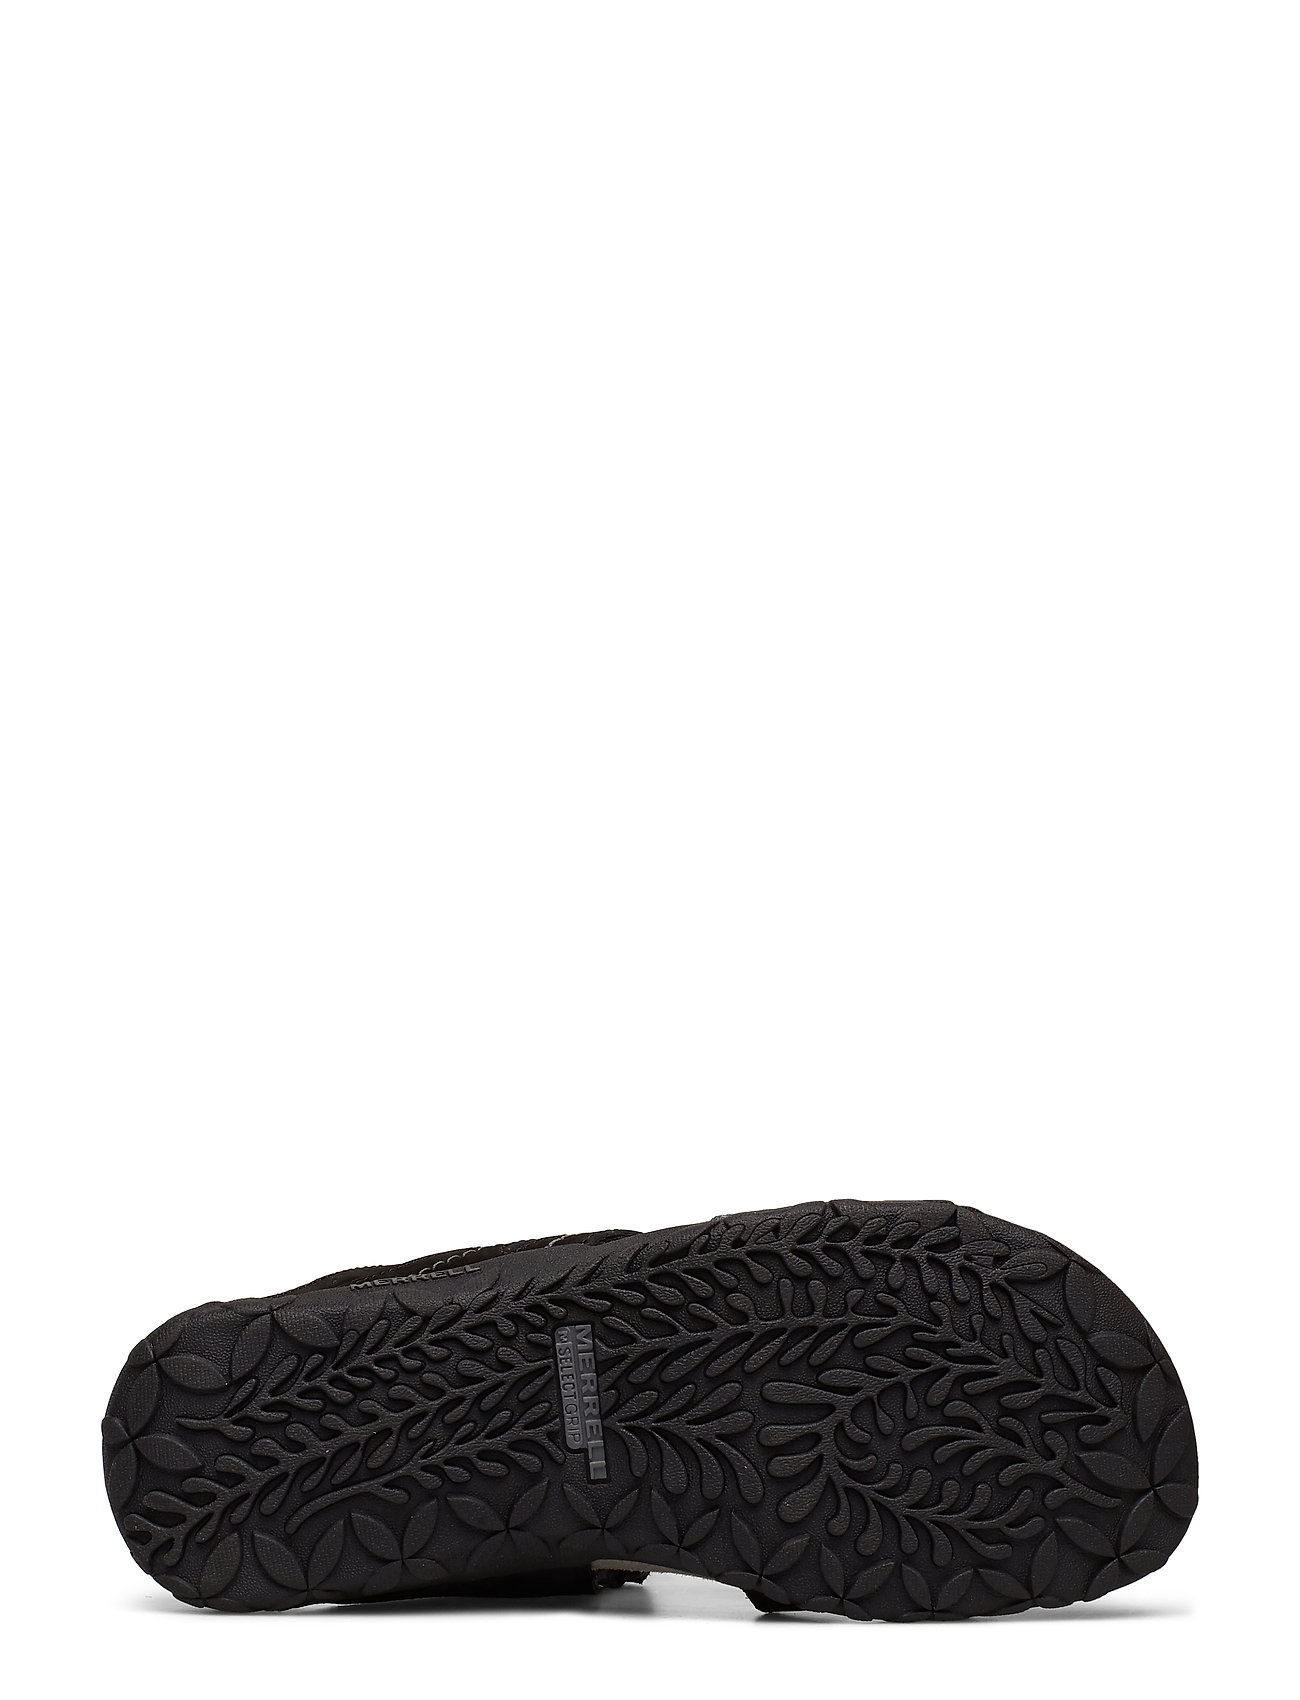 Terran Weave Ii Black (Black) (525 kr) - Merrell